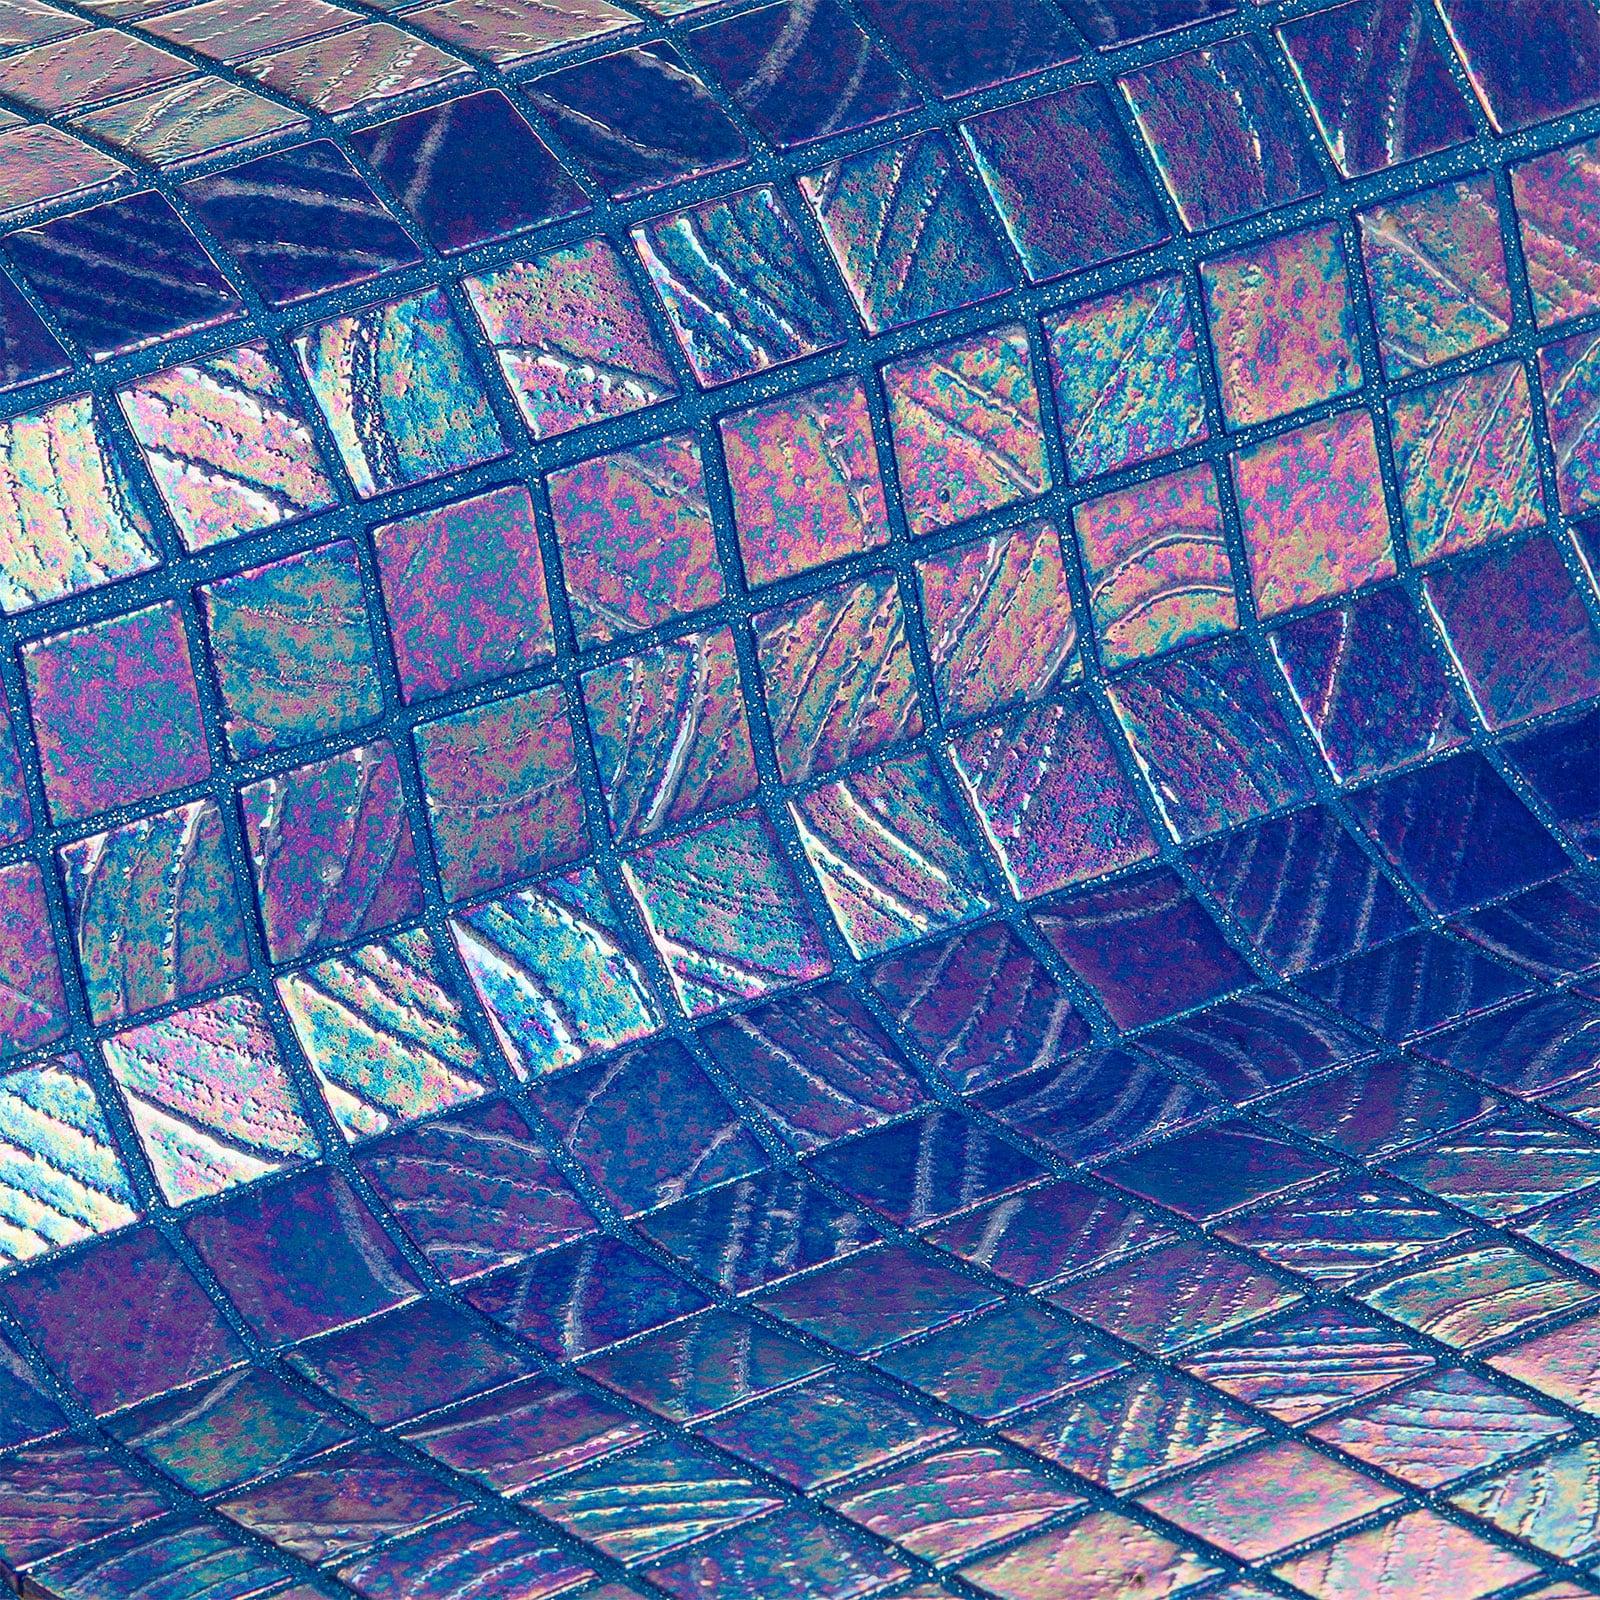 Masaya-Vulcano-Mosaic-Ezarri.jpg